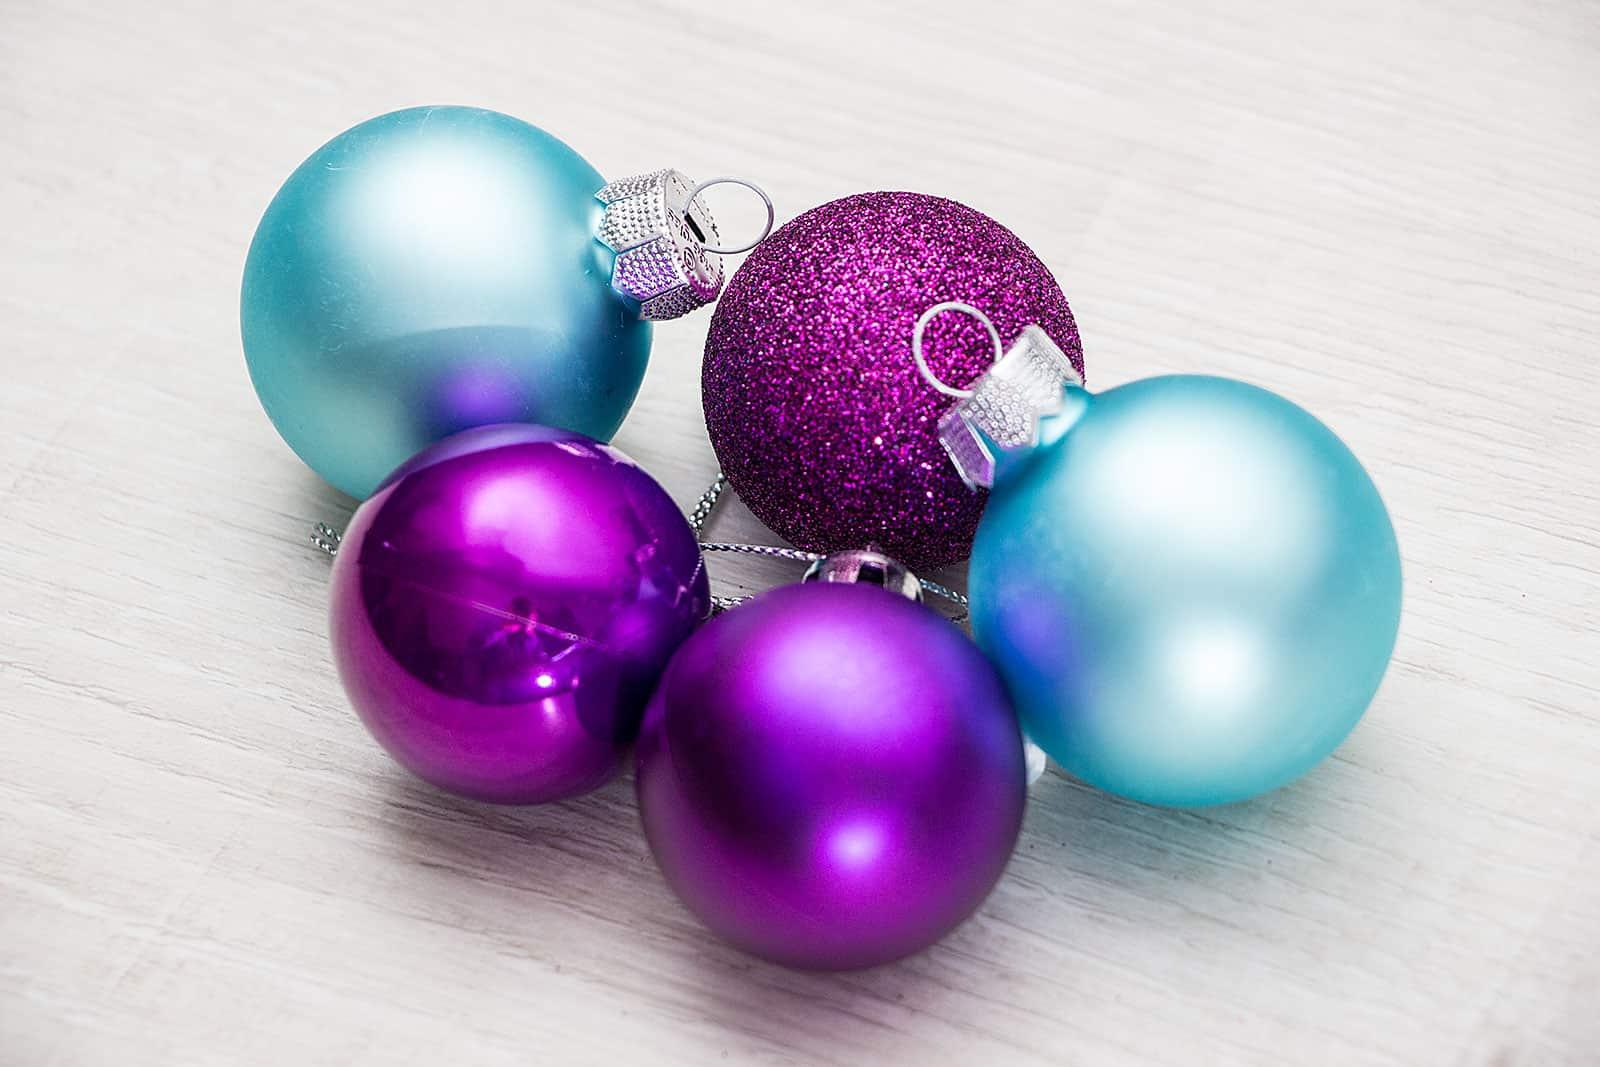 Seit Wann Gibt Es Christbaumkugeln.Weihnachtskugeln Lila Geschmackvoller Weihnachtsschmuck